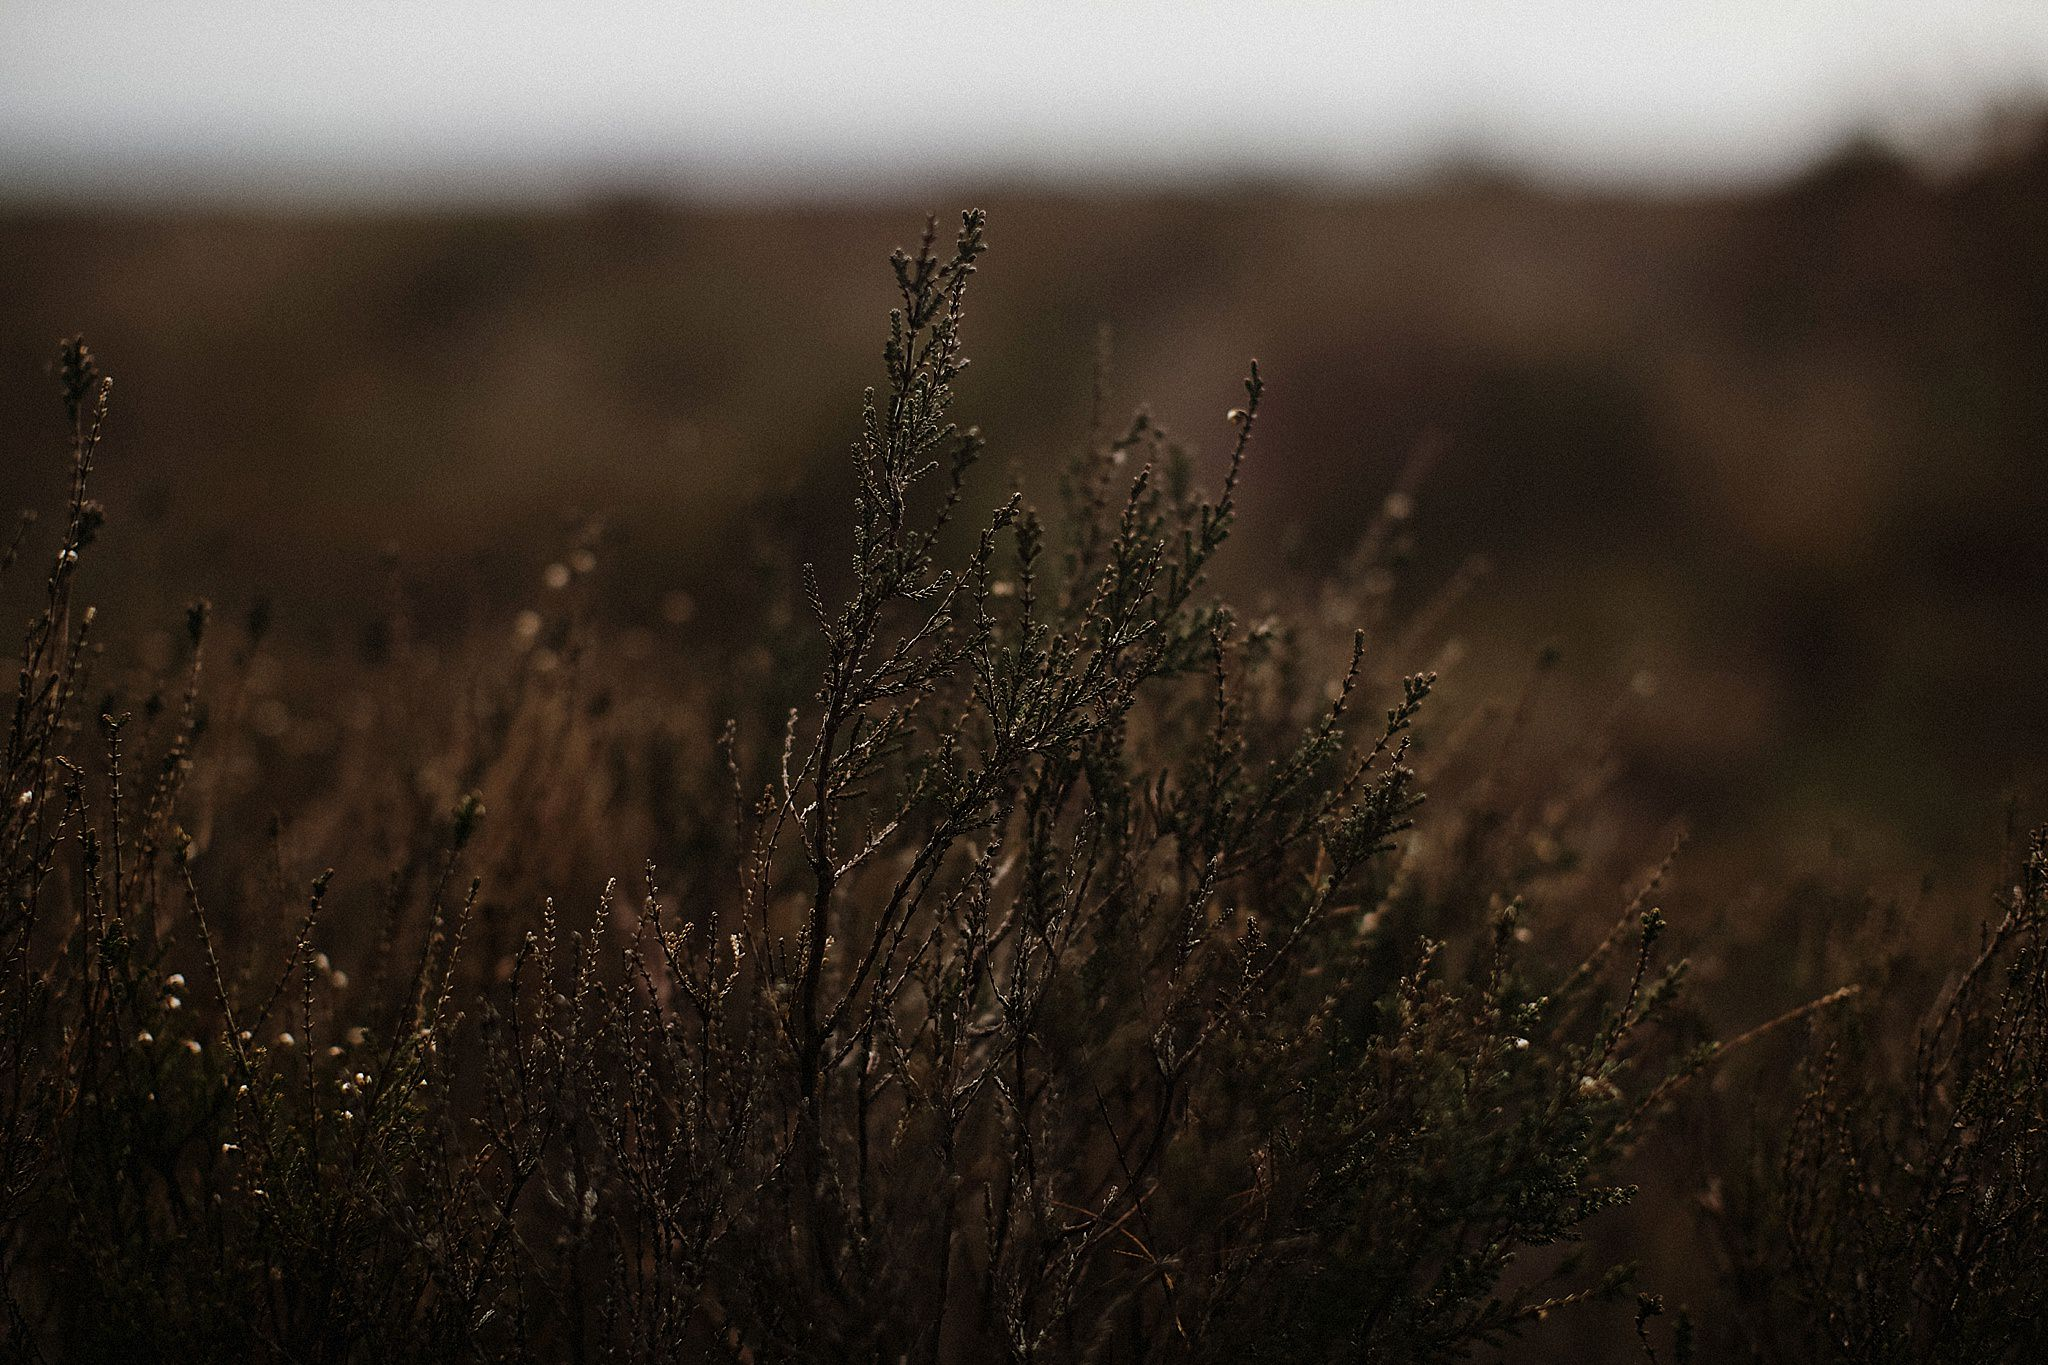 Derbyshire_Photographer_0012.jpg